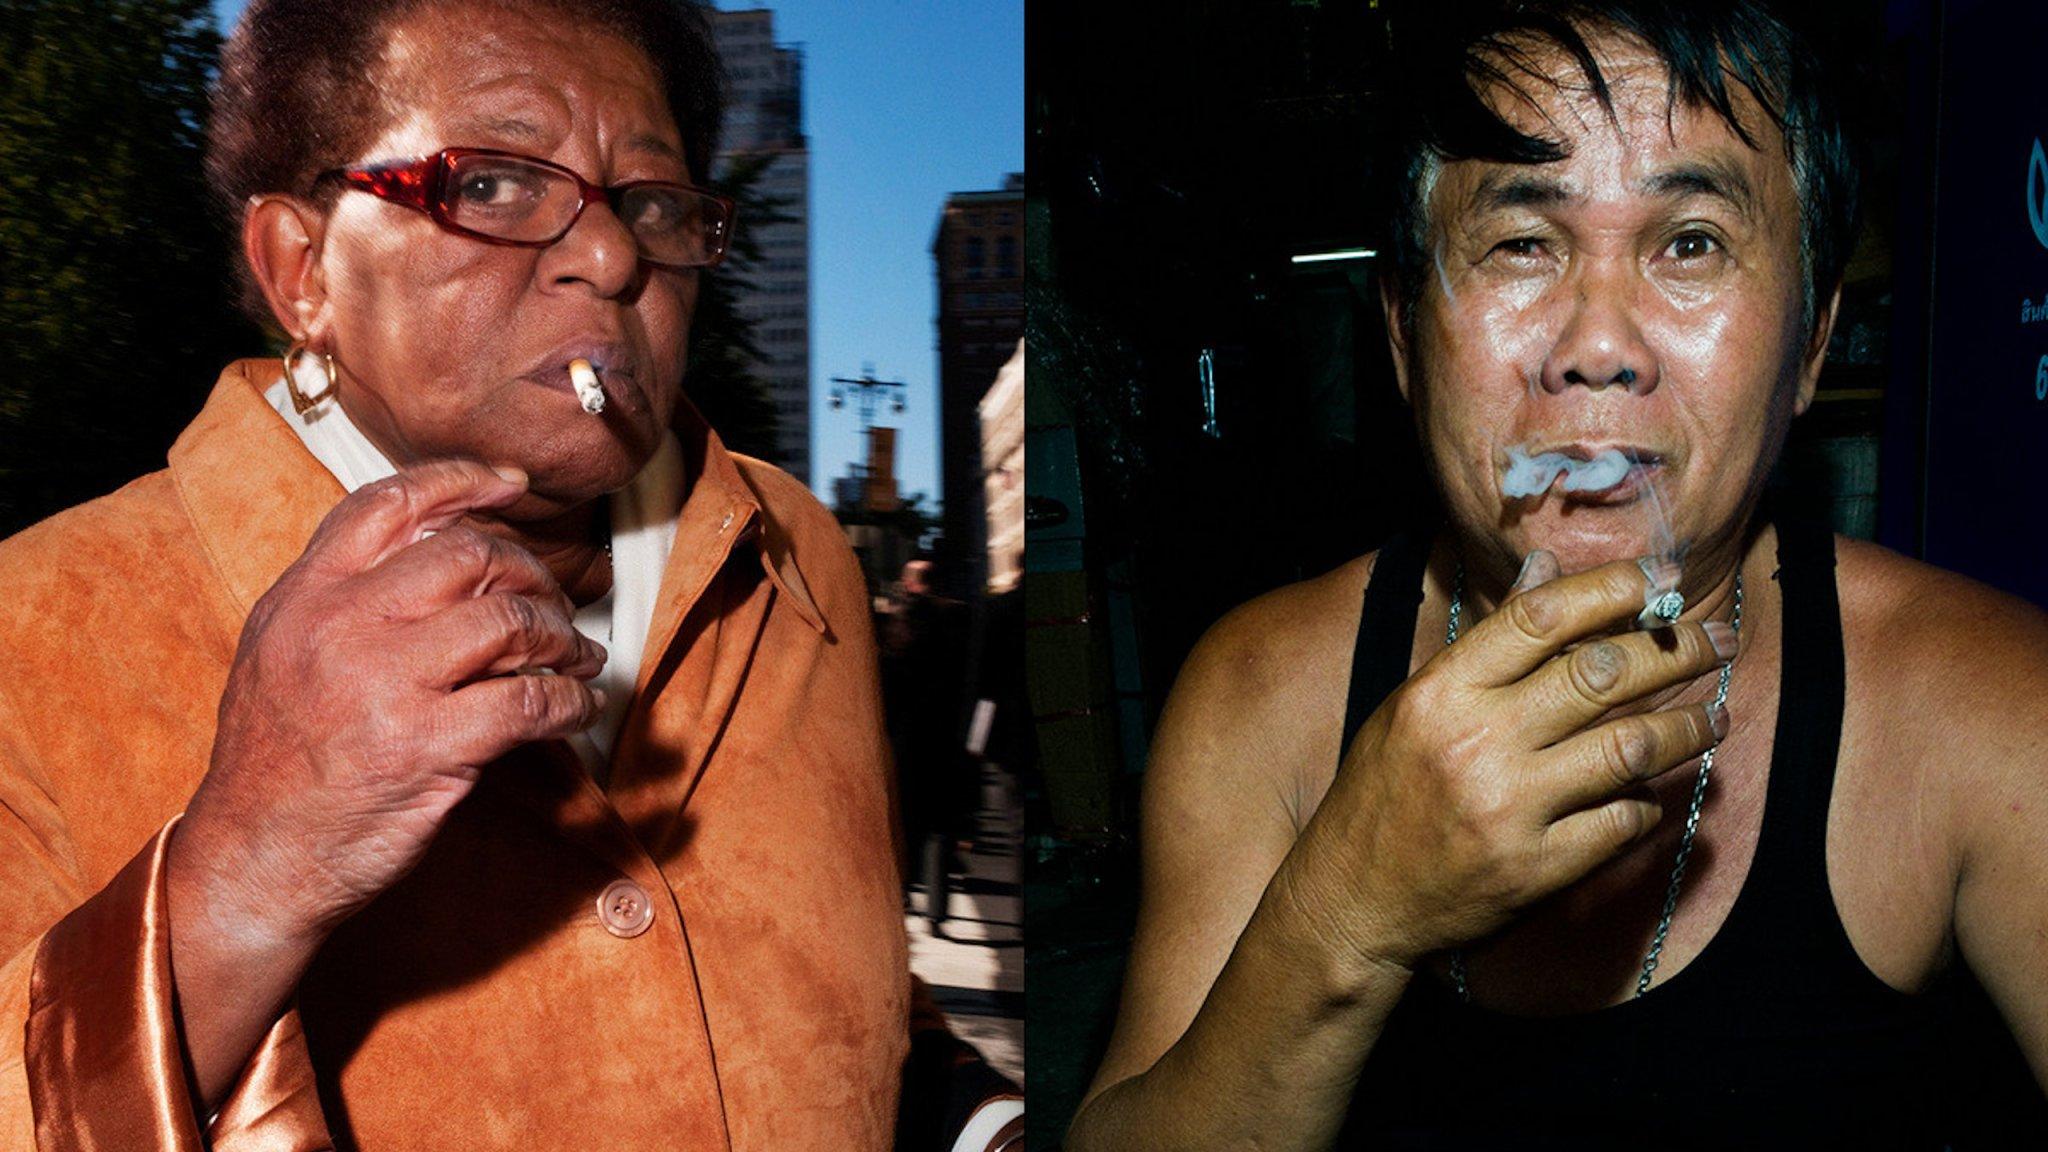 Street portraits inspiring us to capture interesting characters | Photofocus